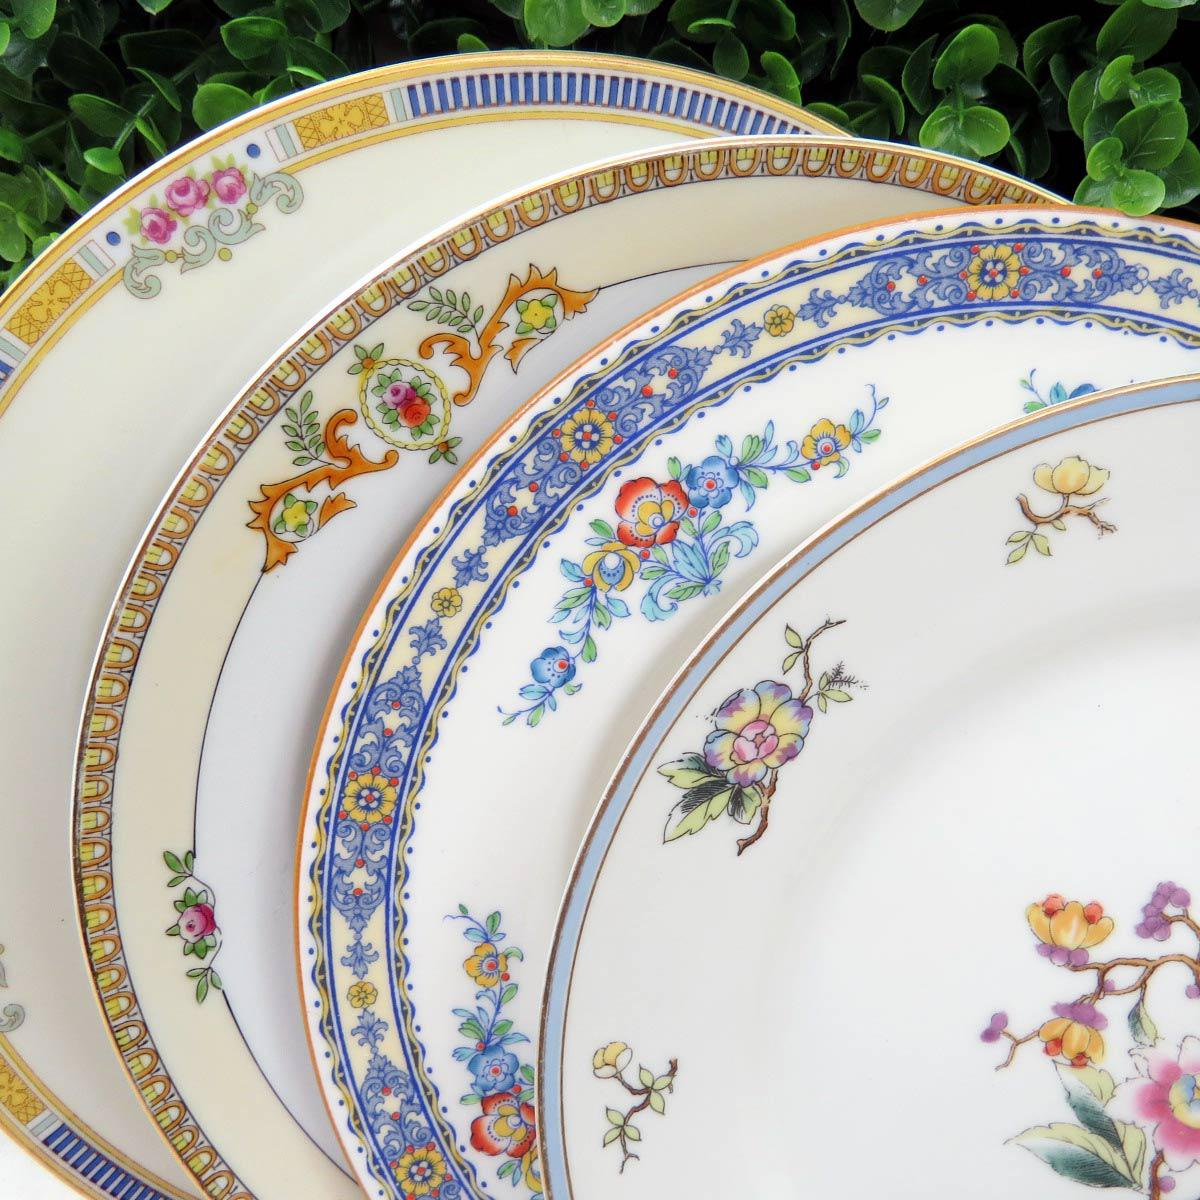 Vintage Mismatched Fine China Dinner Plates - Set of 4 - Image 3 of 11 & Vintage Mismatched Fine China Dinner Plates - Set of 4 | Chairish